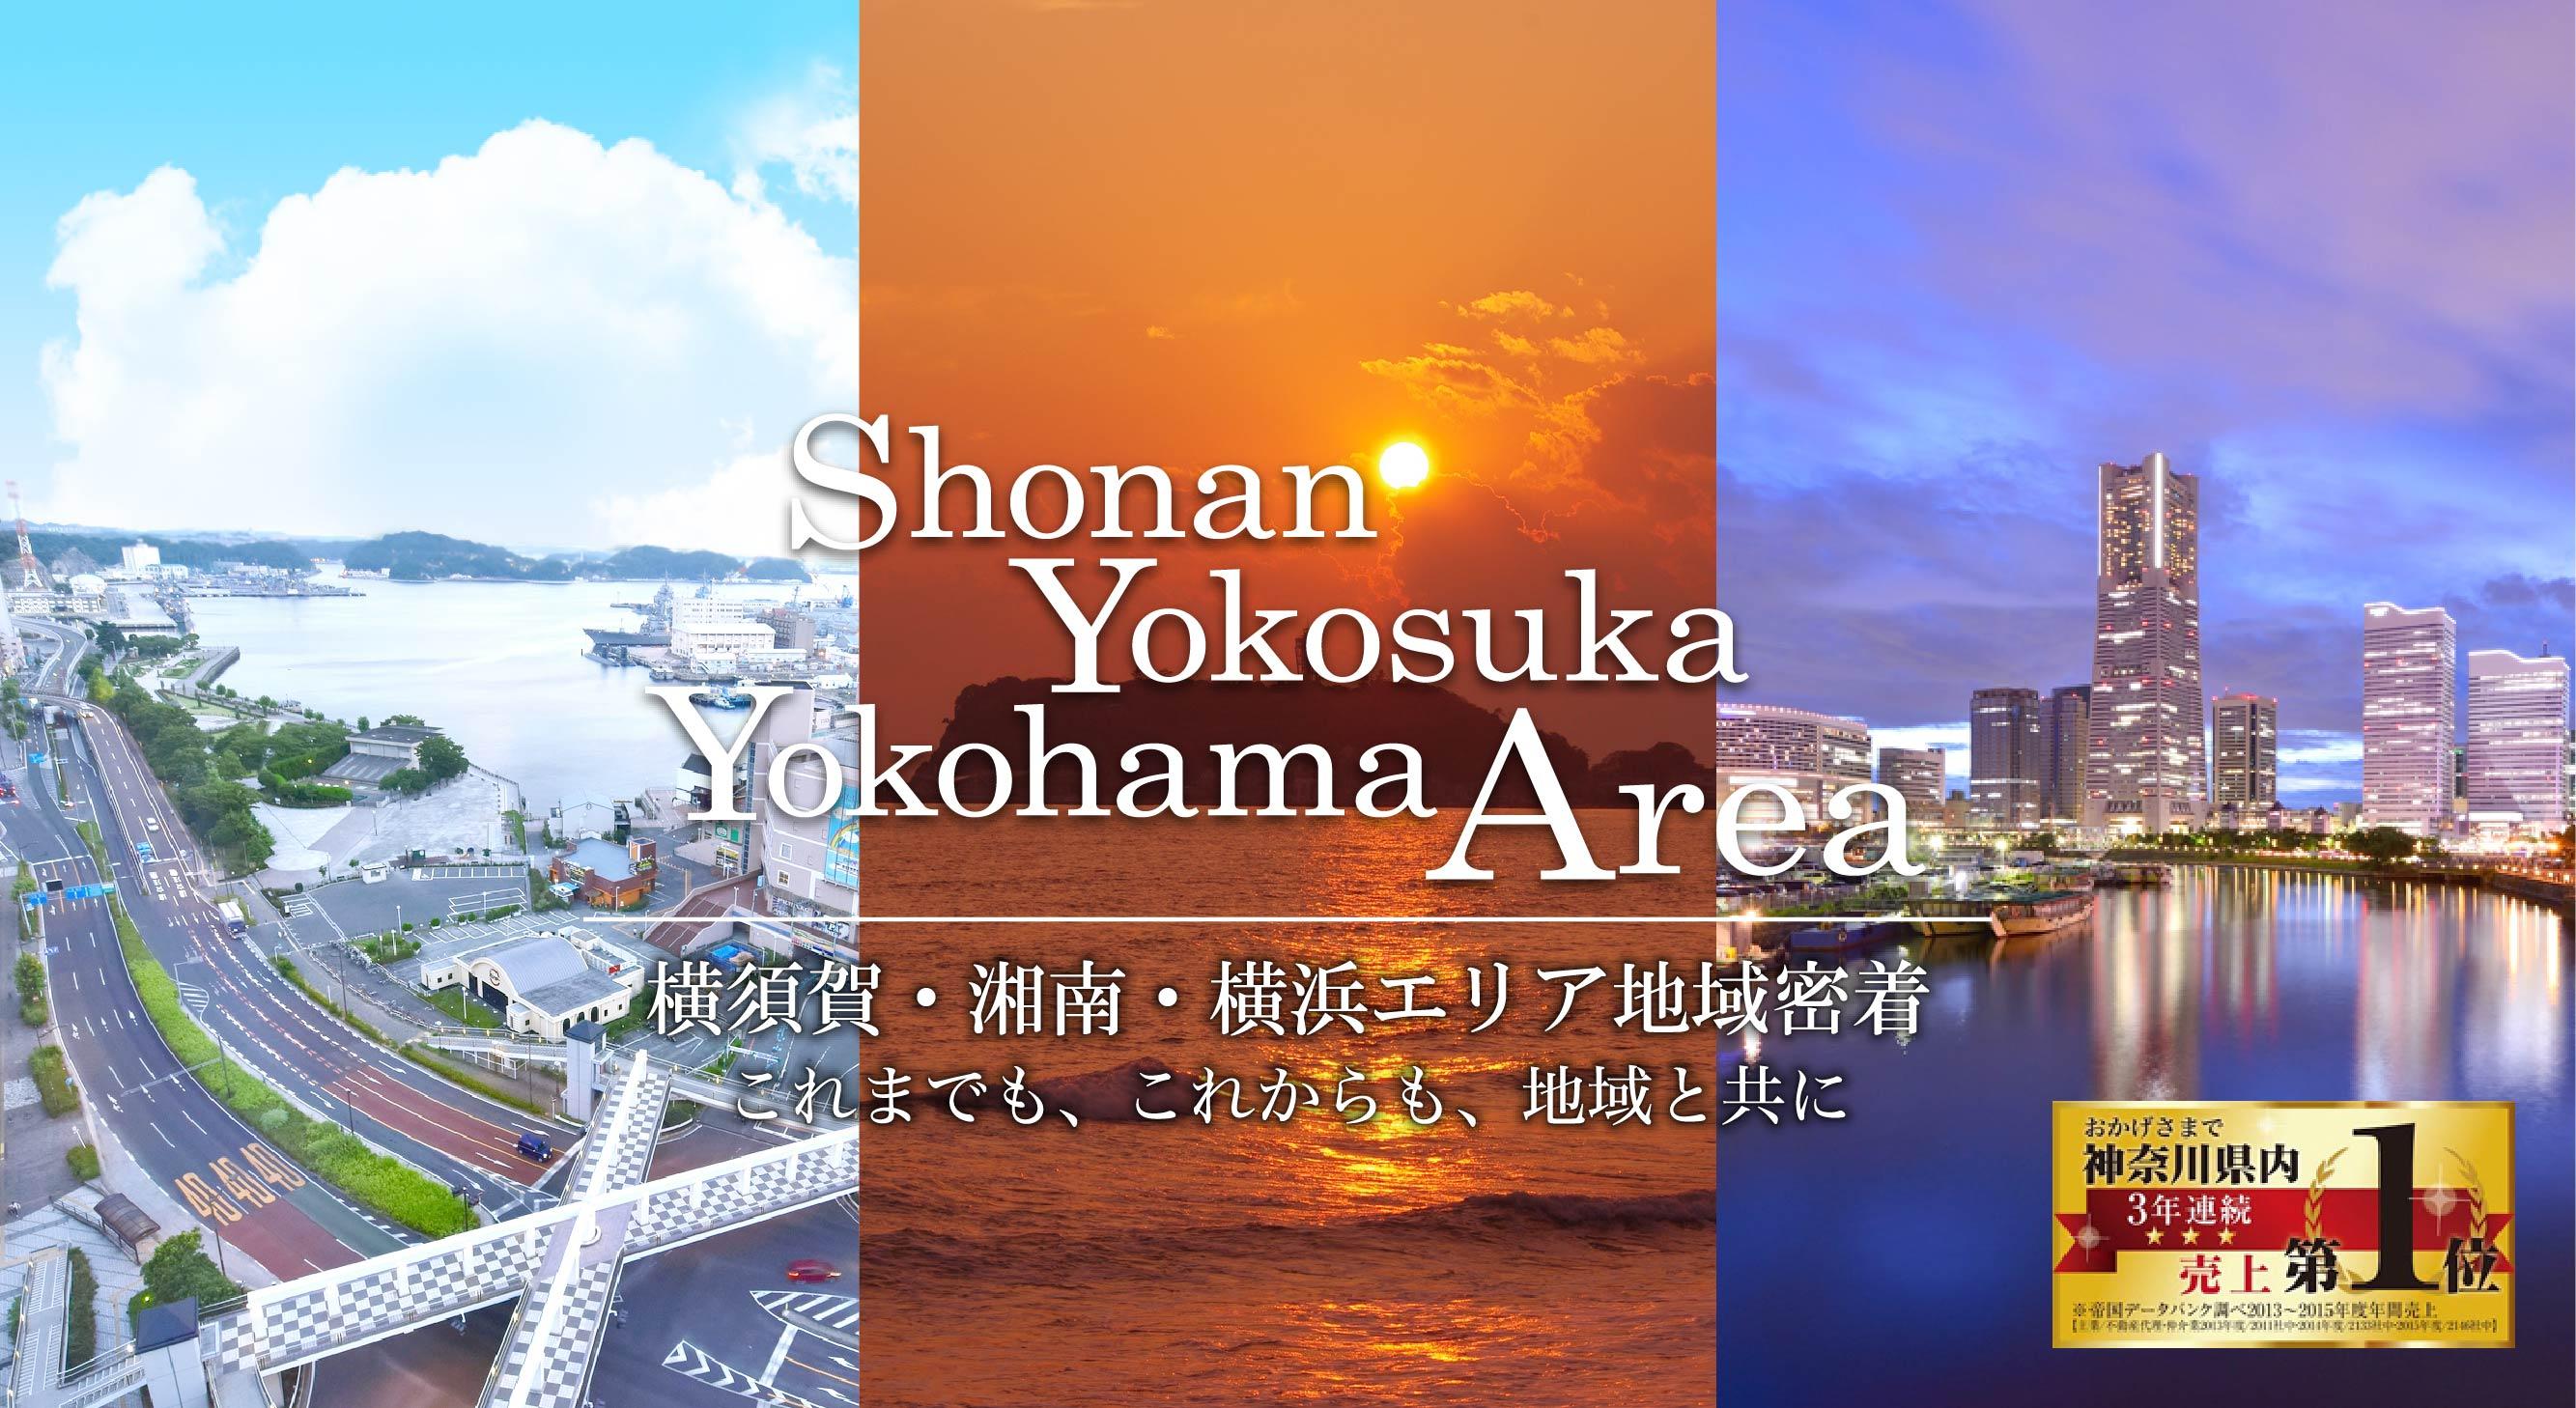 Shonan Yokosuka Yokohama Area 横須賀・湘南・横浜エリア地域密着 これまでも、これからも、地域と共に